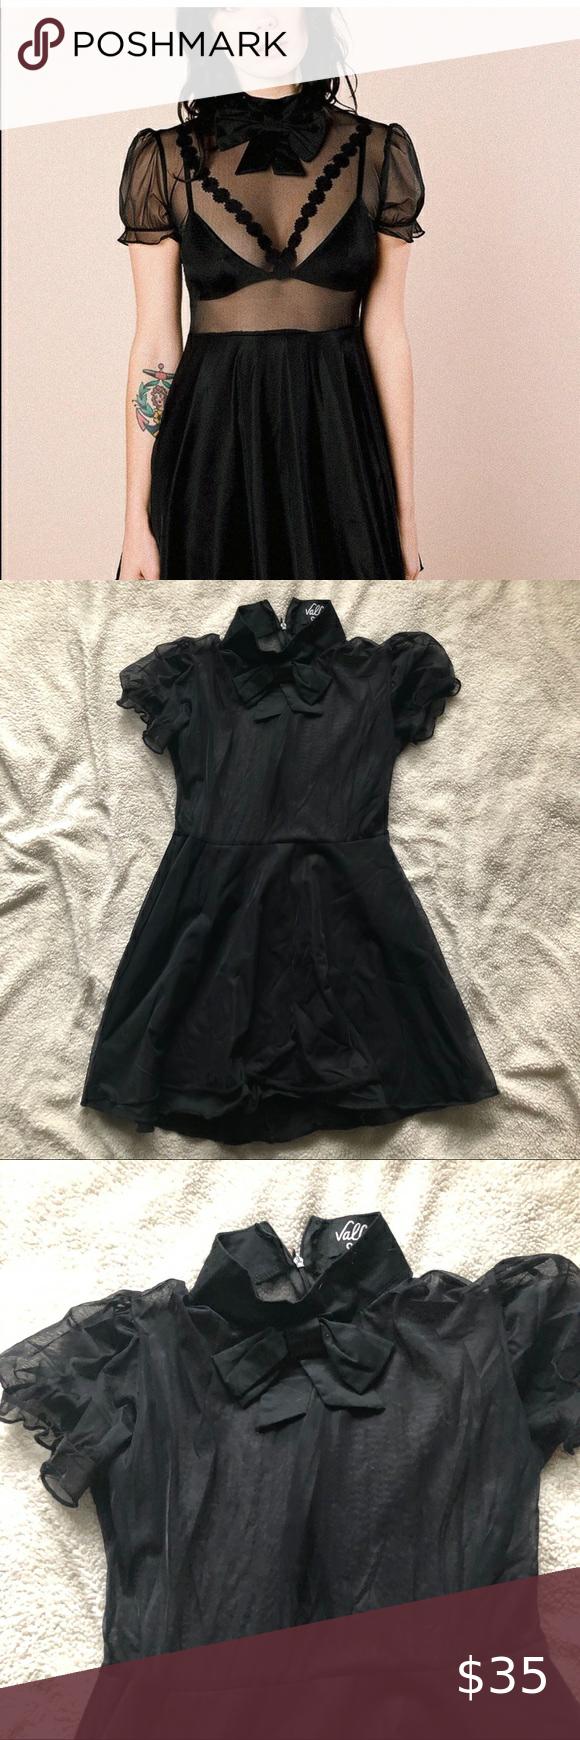 Valfre Sheer Top Dress Sheer Top Dress Dresses Colorful Dresses [ 1740 x 580 Pixel ]